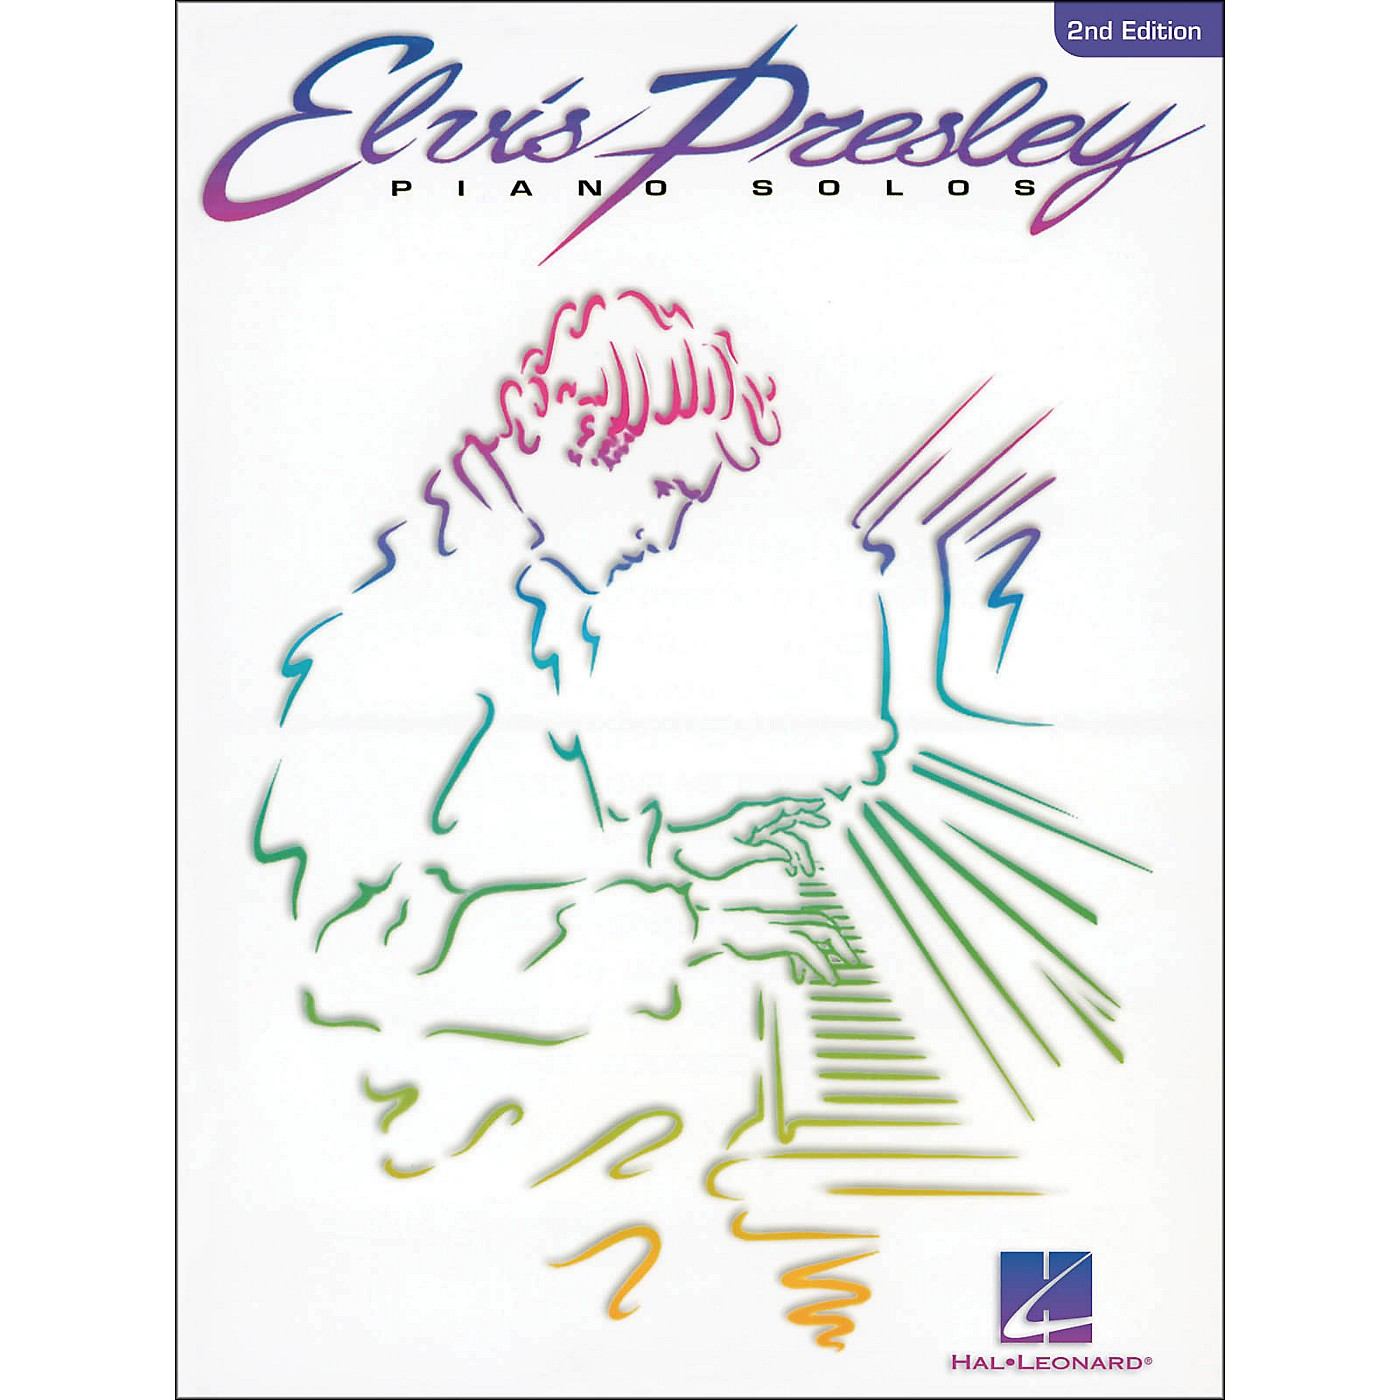 Hal Leonard Elvis Presley Piano Solos 2nd Edition thumbnail